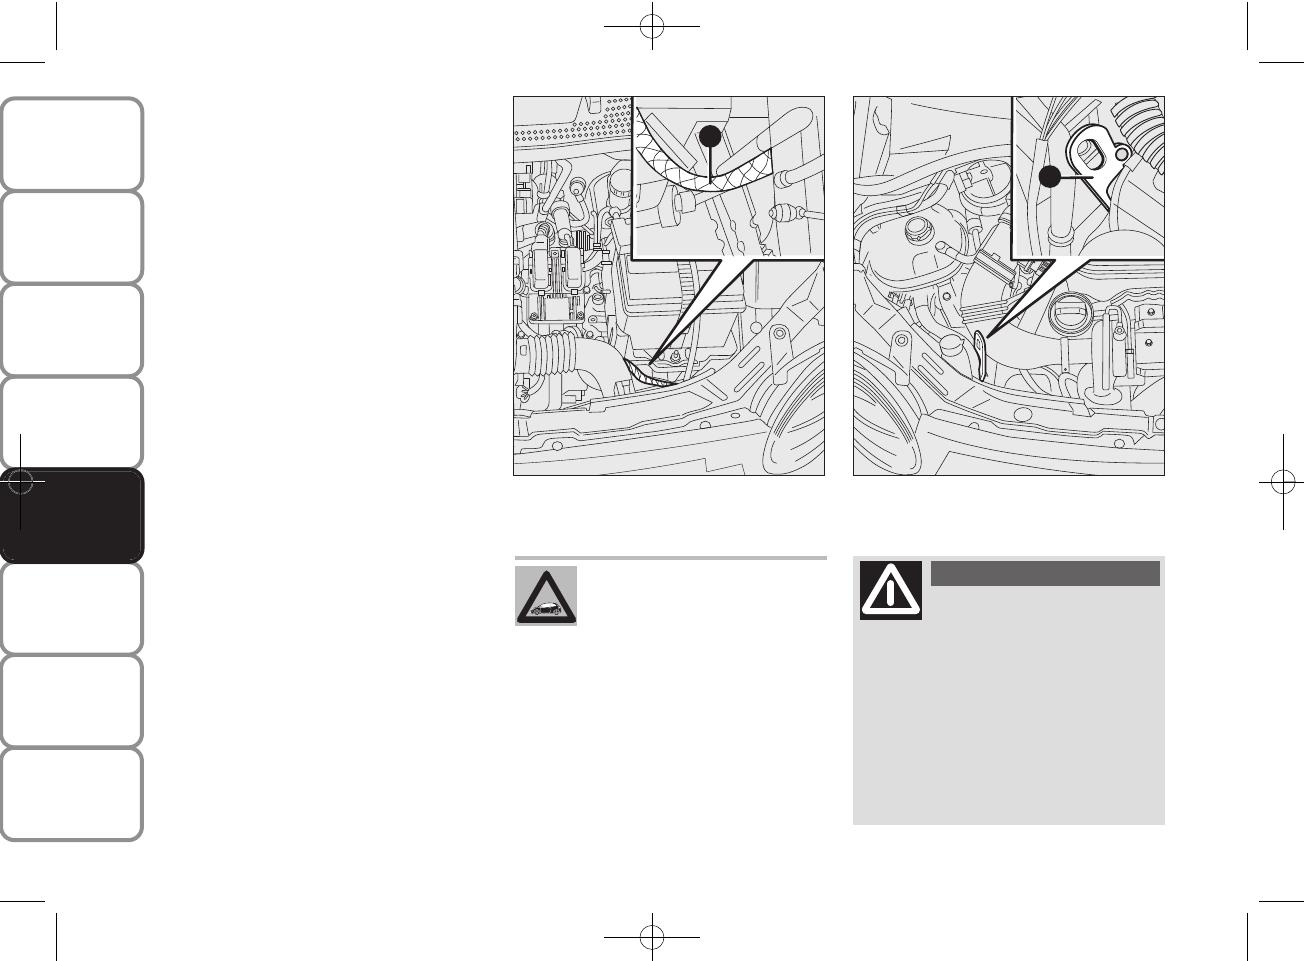 Handleiding Ford Ka Pagina 115 Van 189 Nederlands